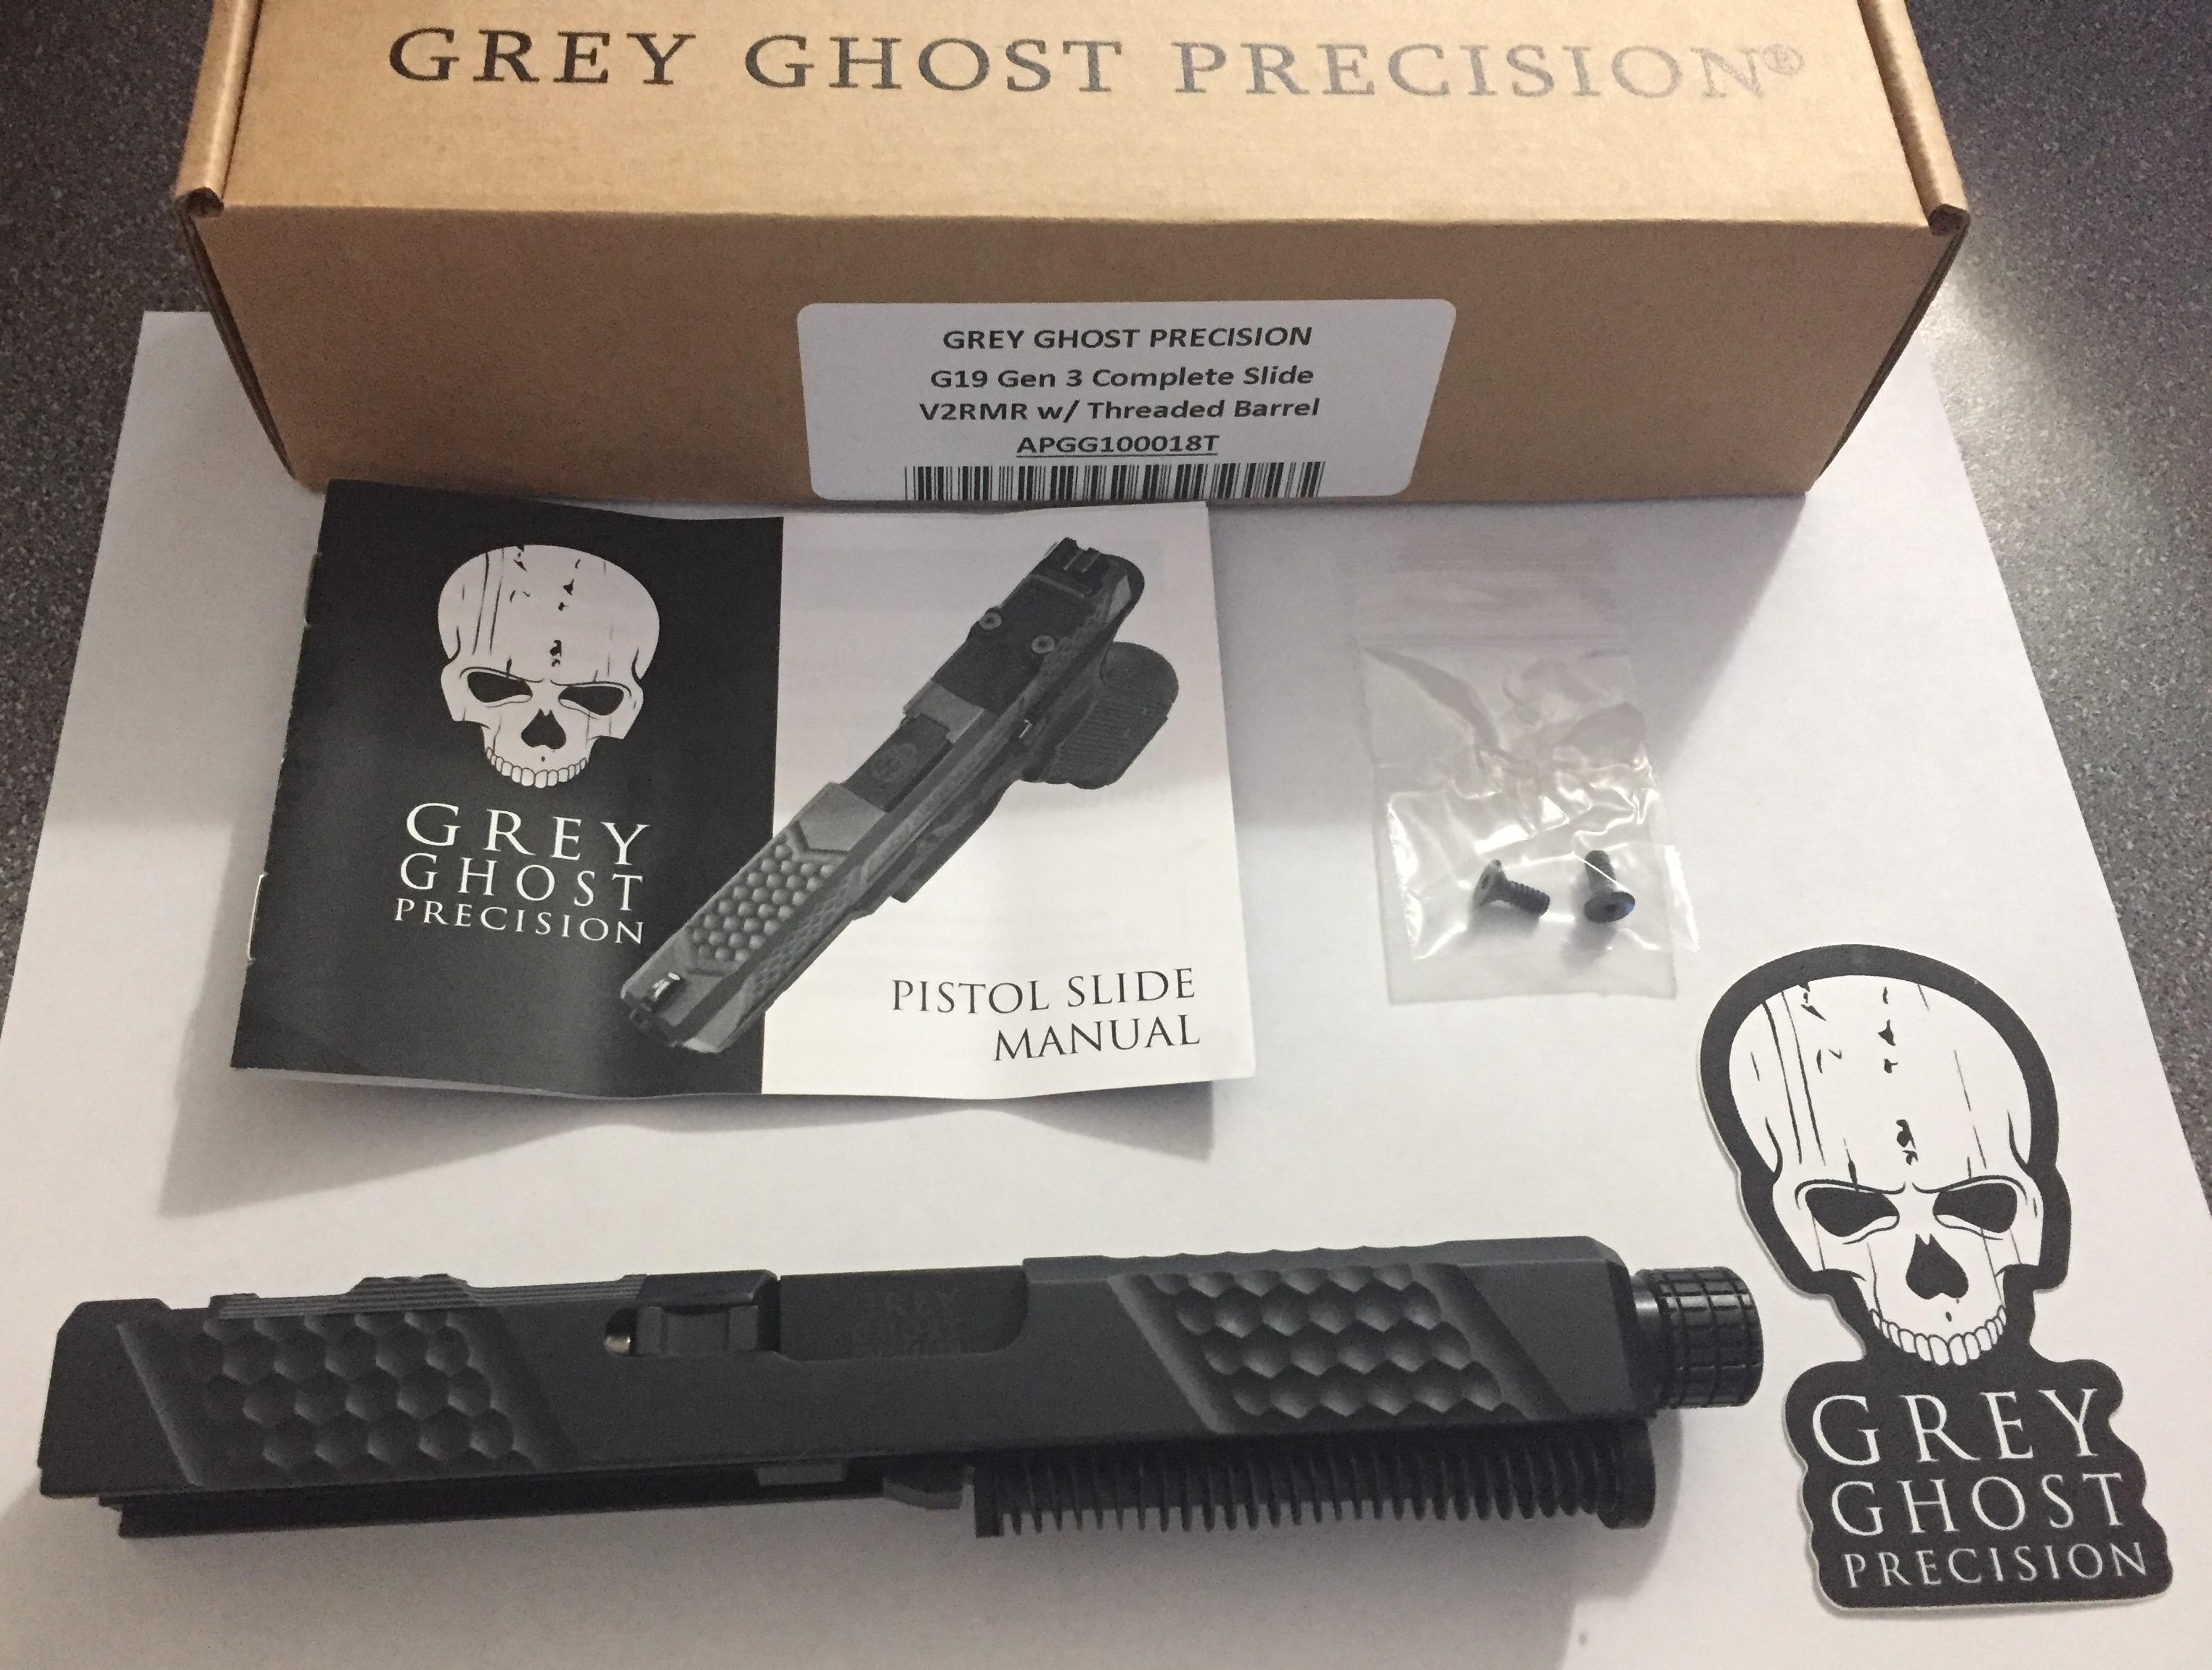 Aero Precision Grey Ghost Precision Glock 19 Slide, Complete V2 APGG100018T  V2RMR